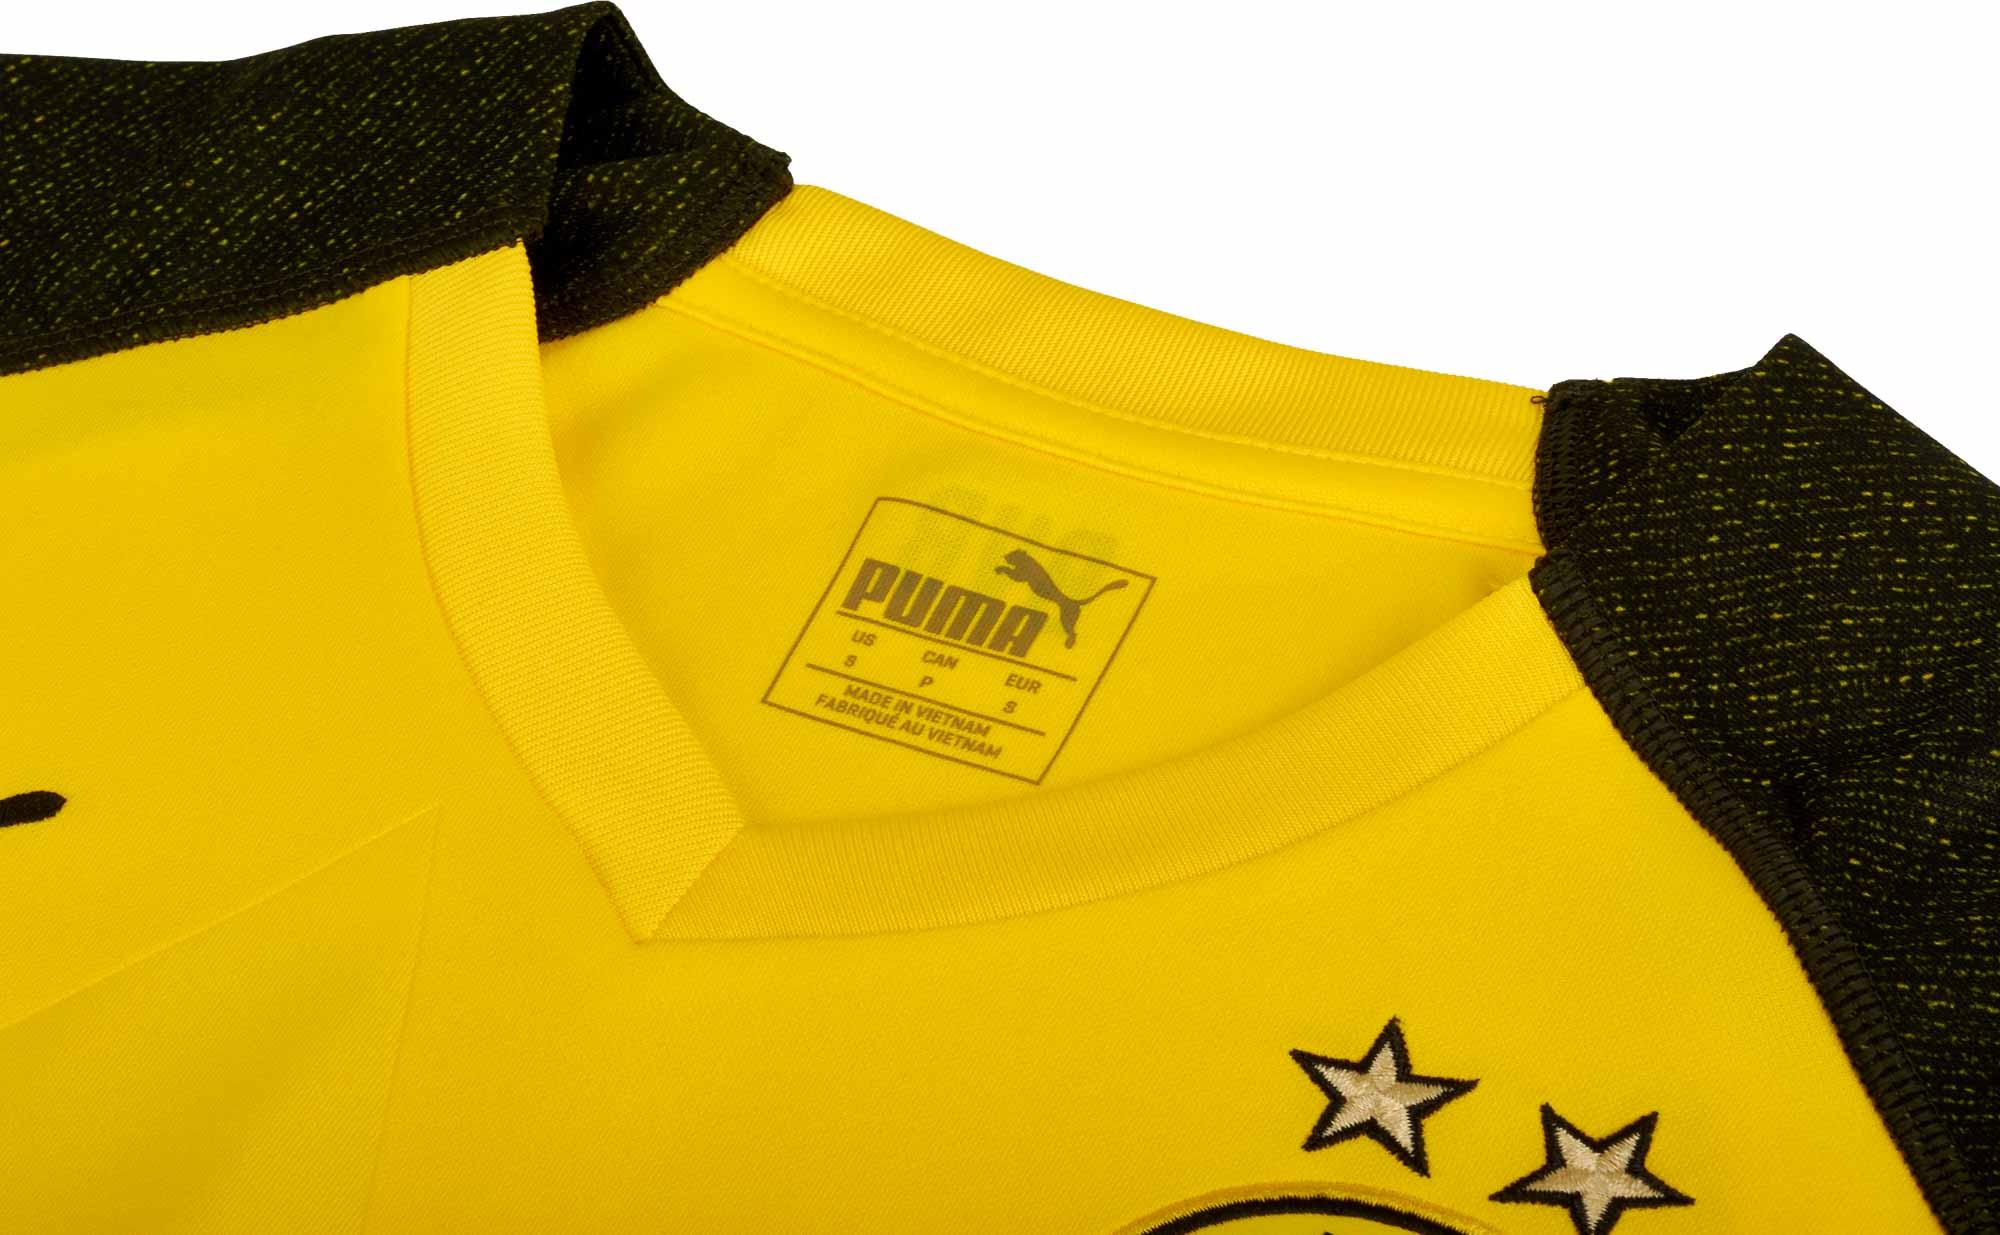 7bdd5f143cf 2018/19 PUMA Christian Pulisic Borussia Dortmund Home Jersey - SoccerPro